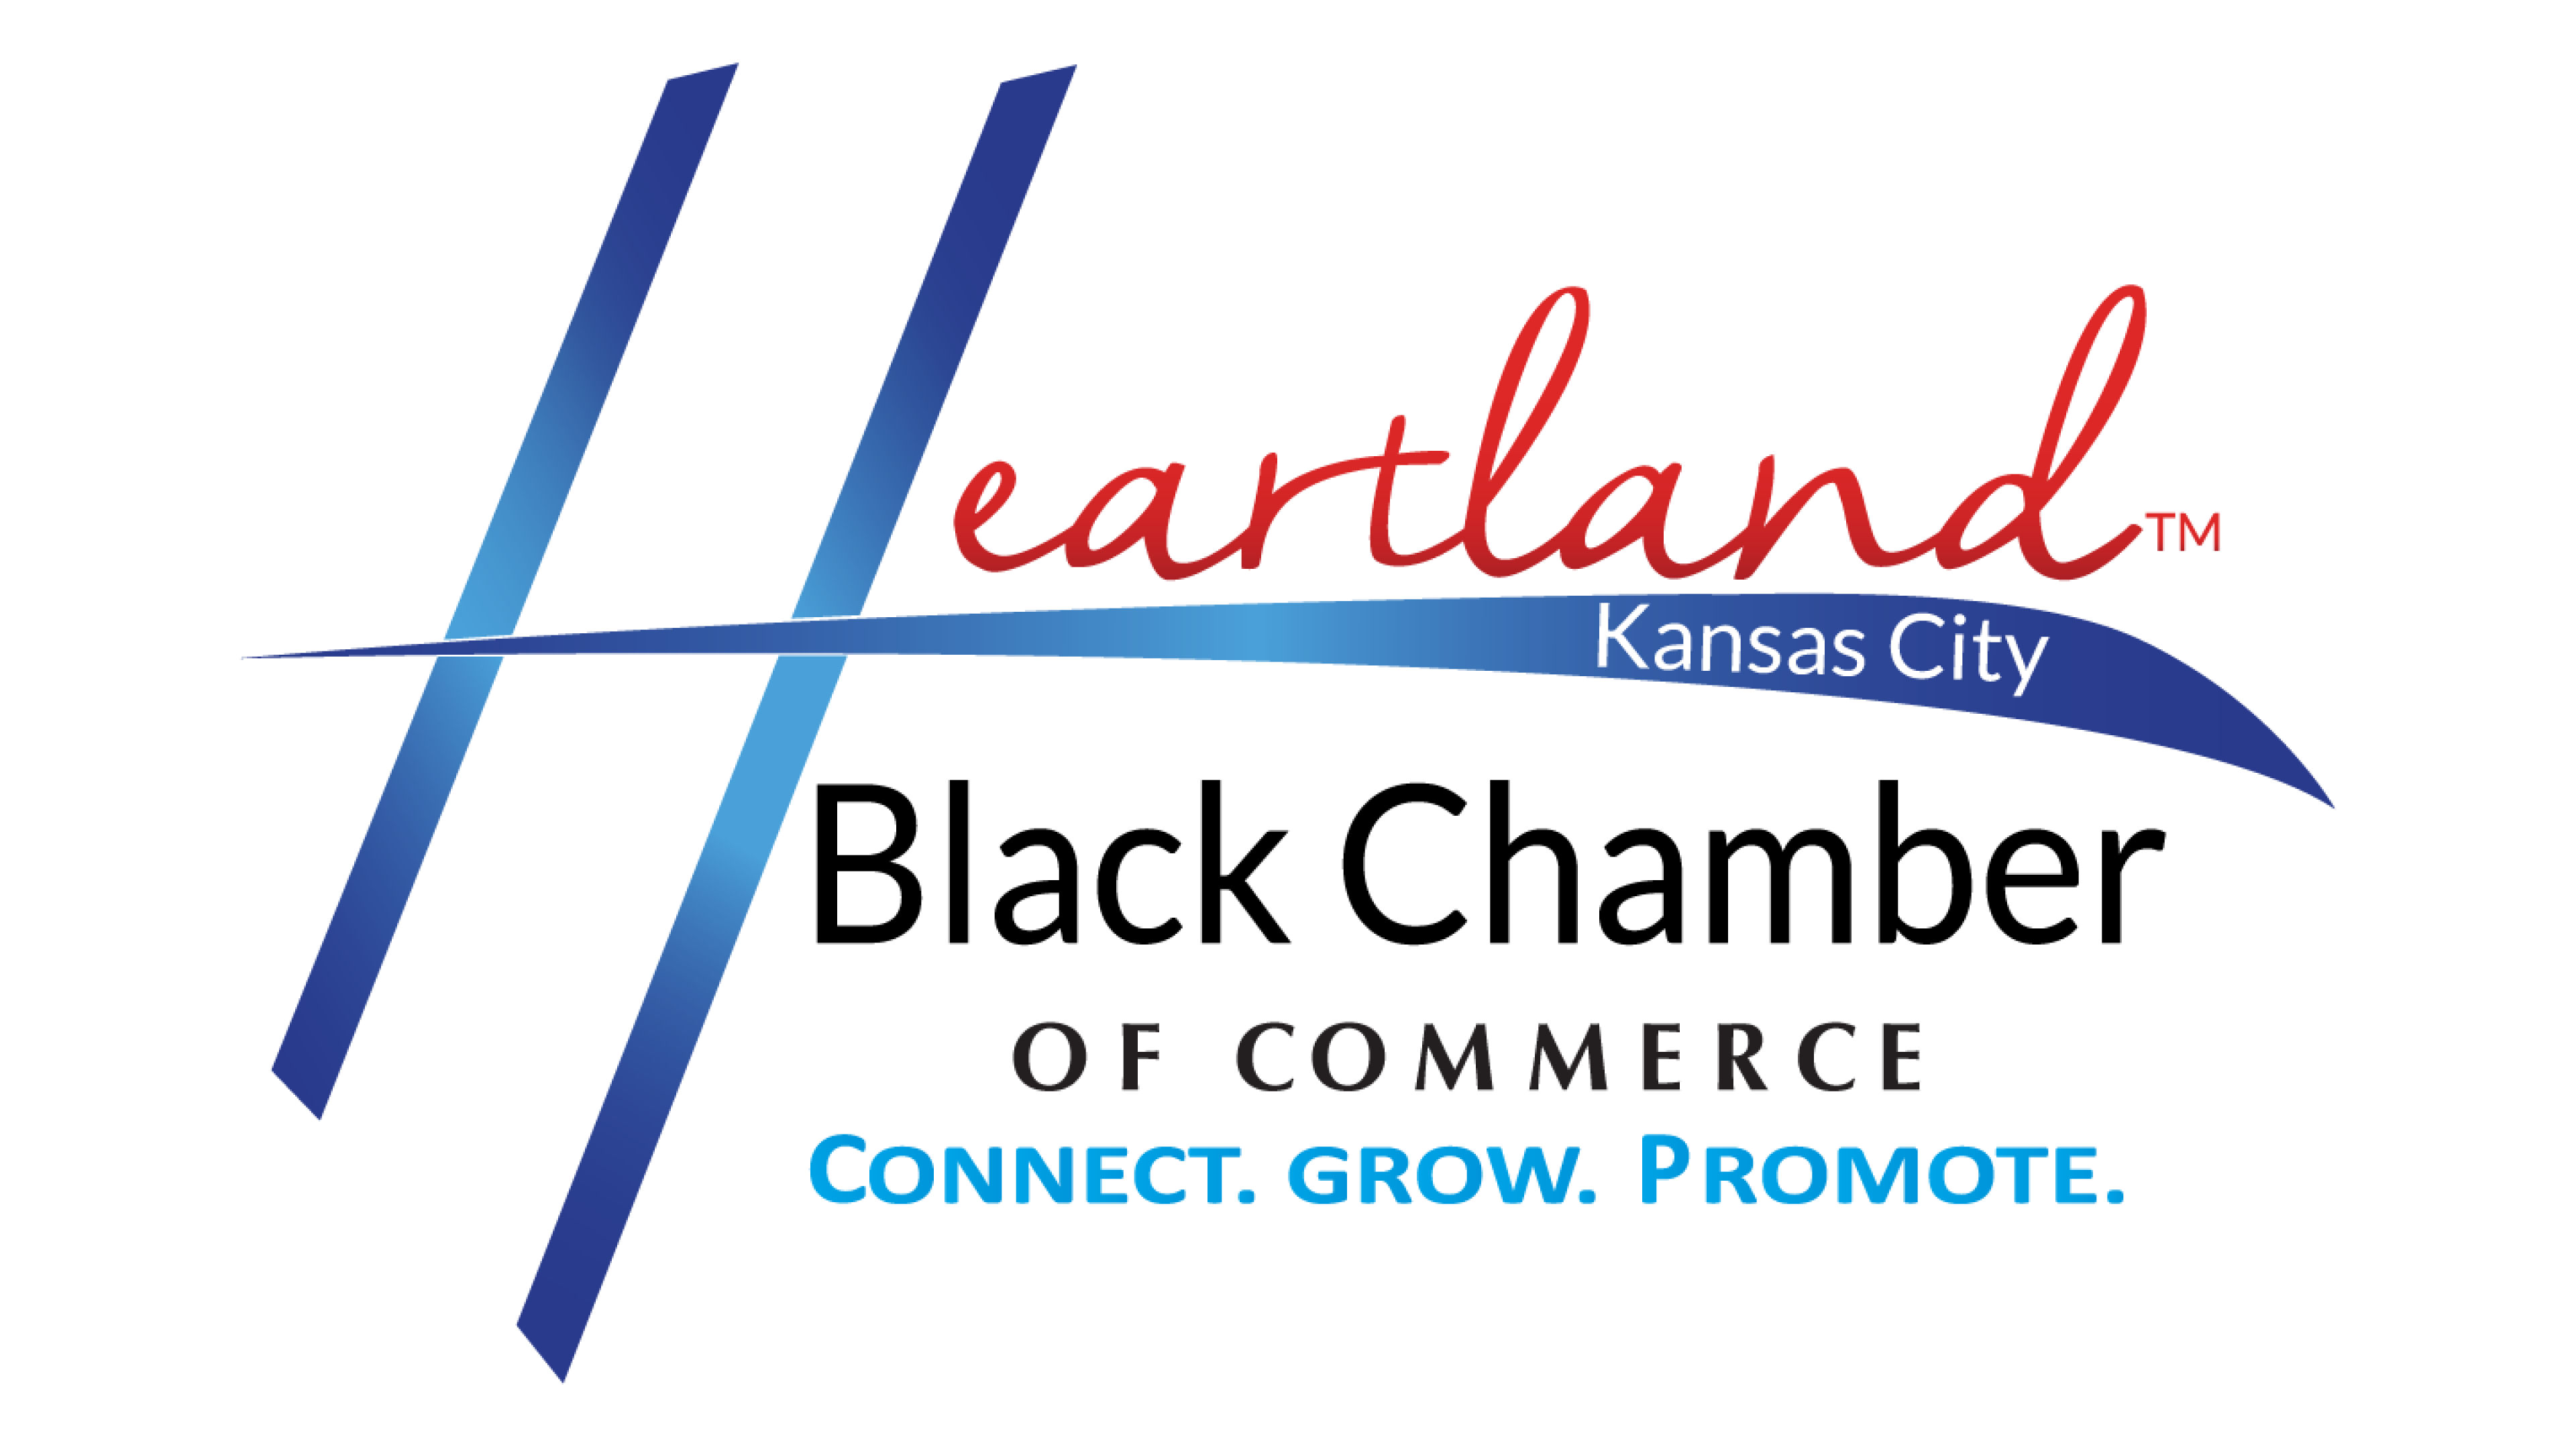 Heartland Black Chamber of Commerce